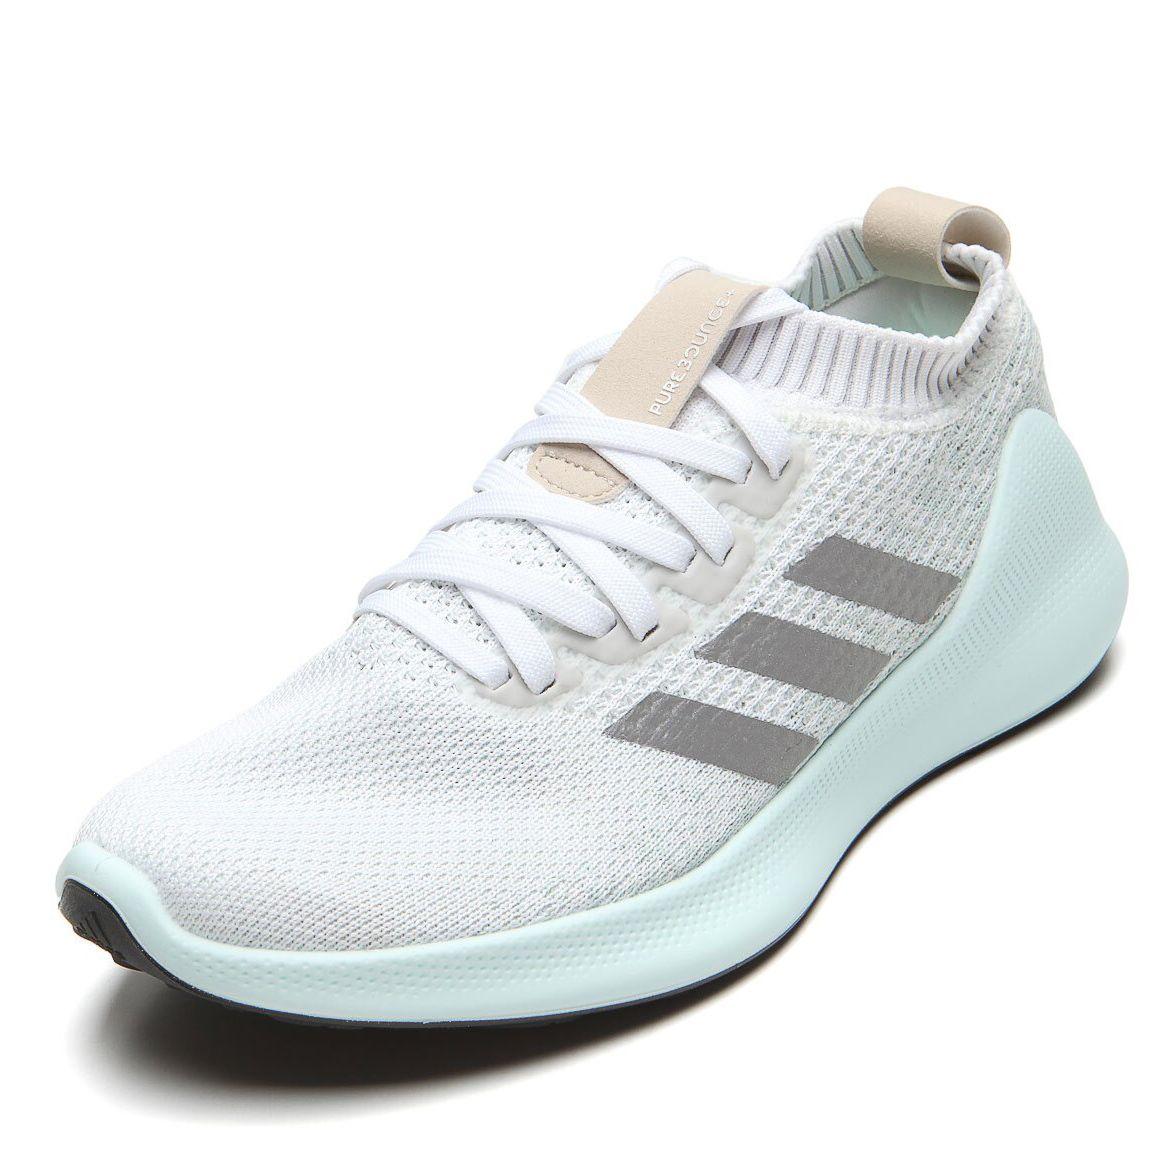 Tênis Adidas Performance Purebounce W Branco Nº40